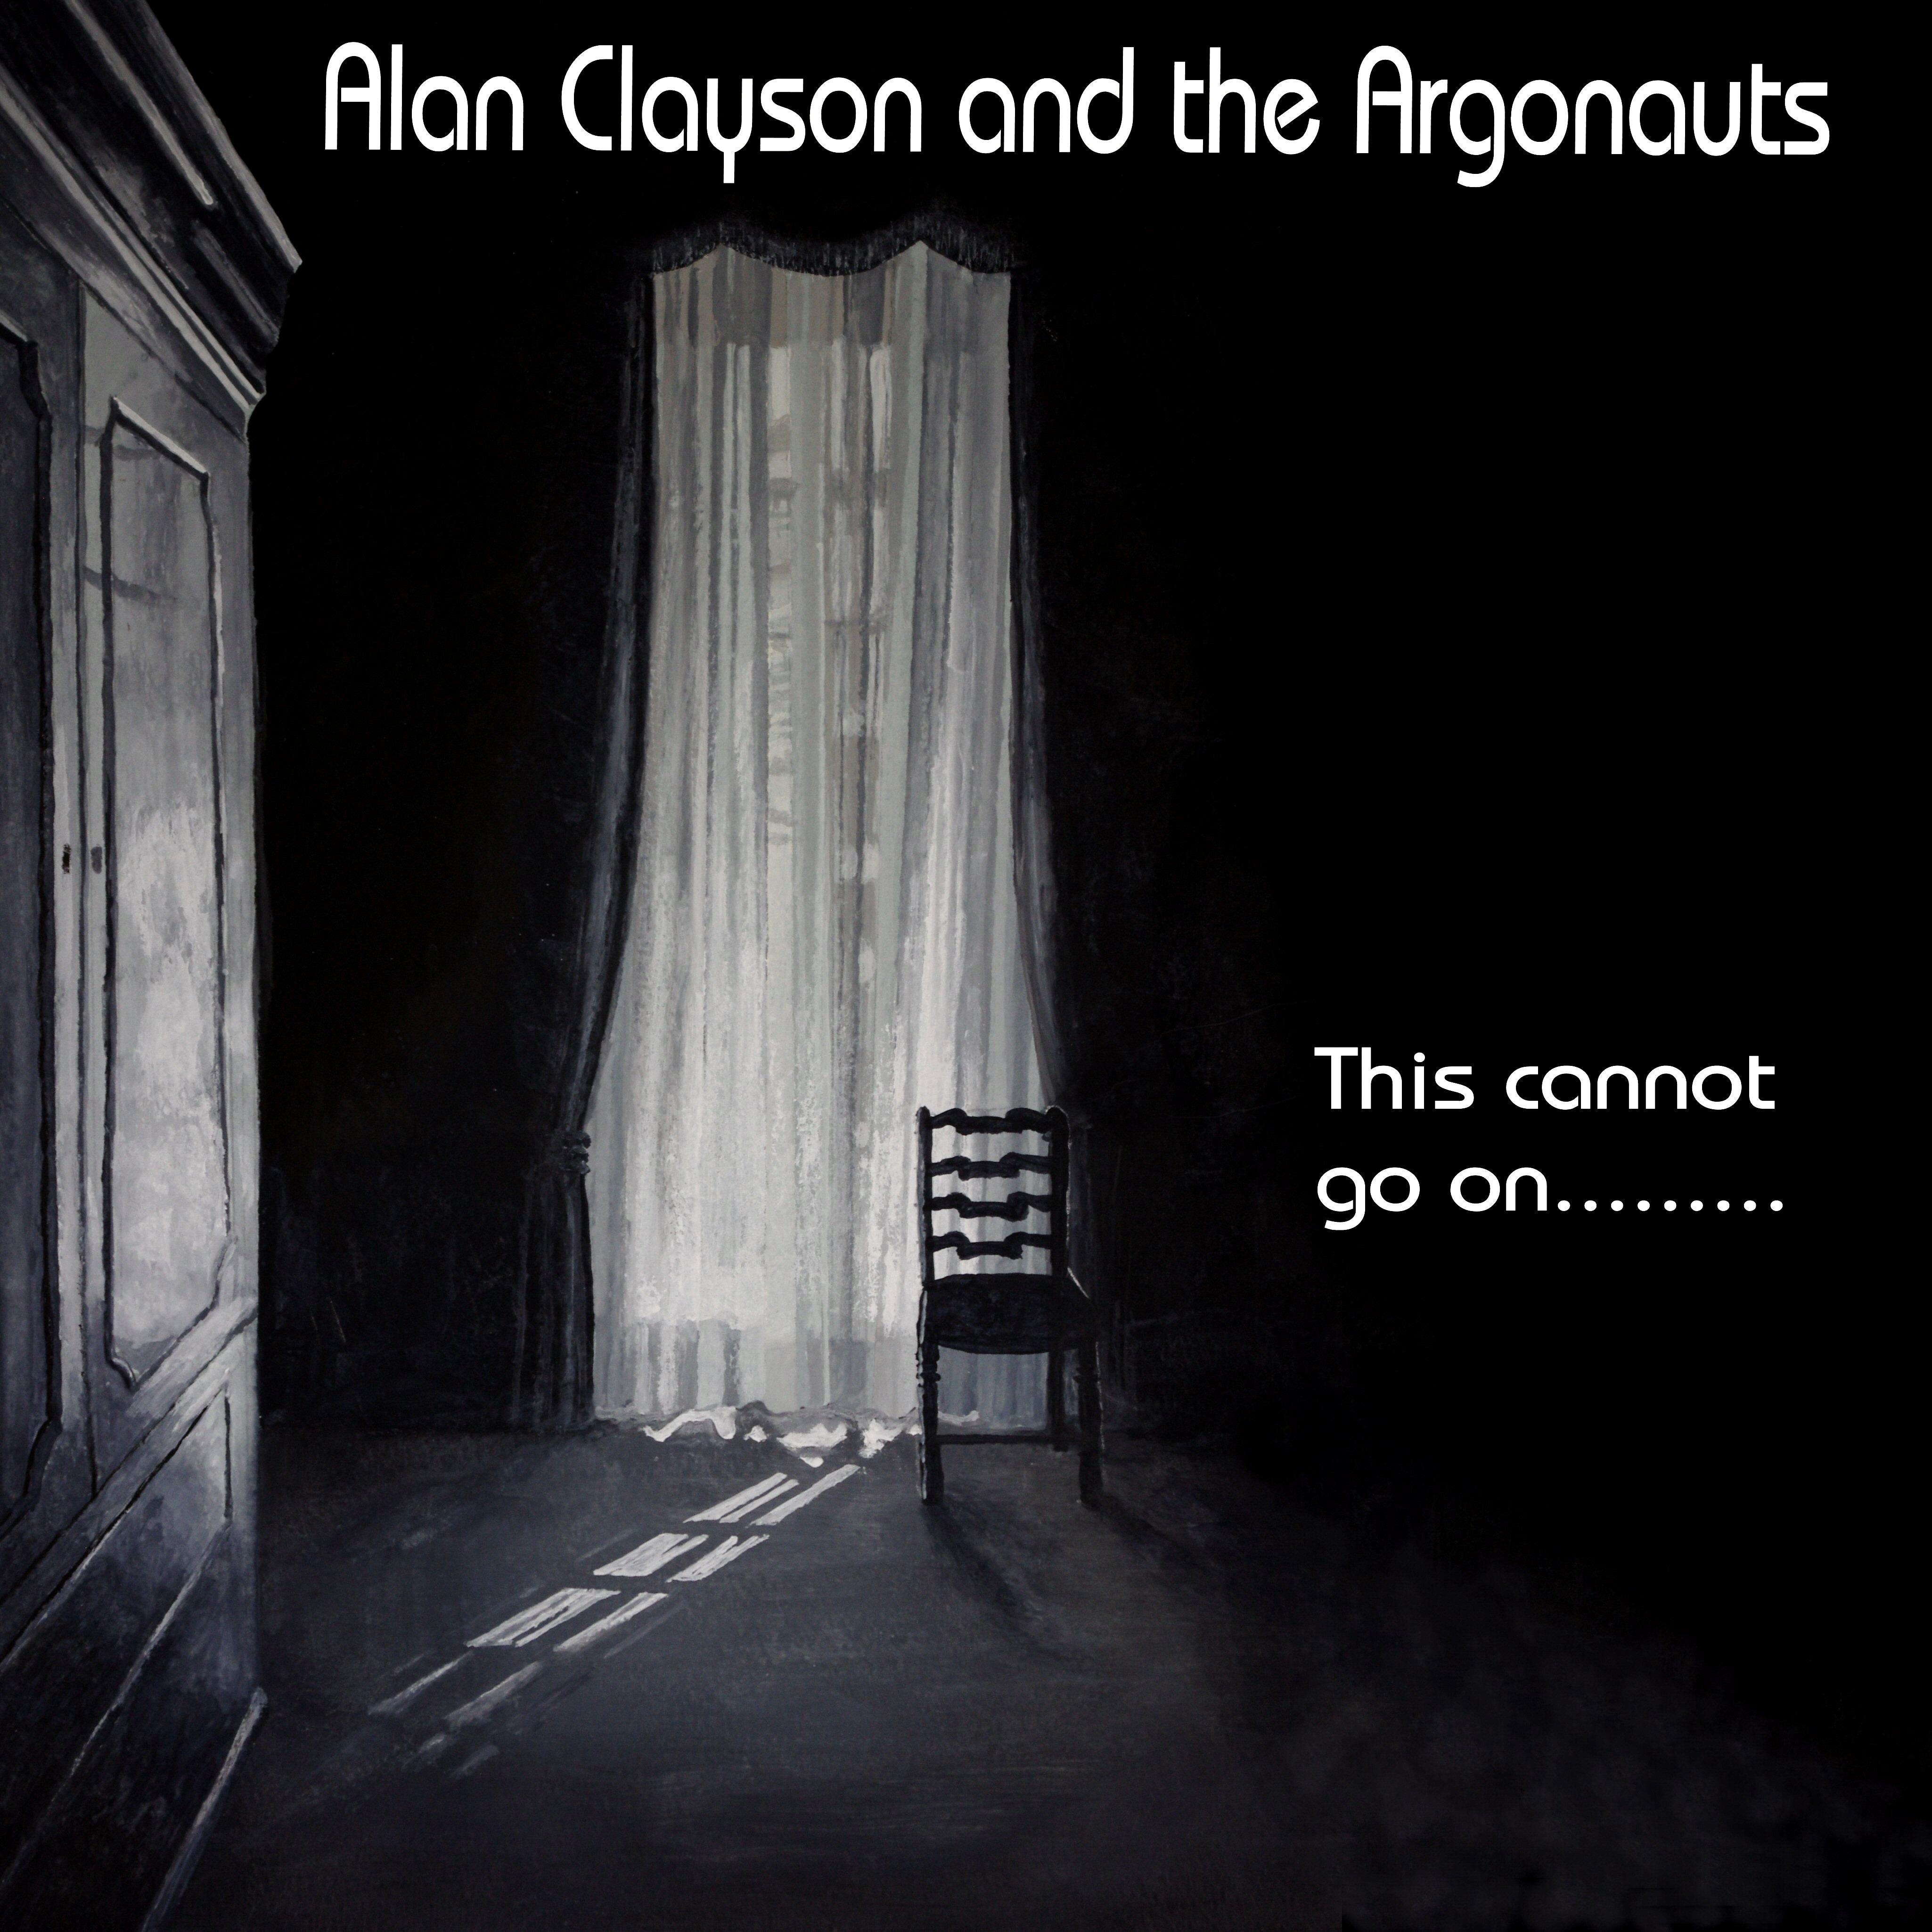 Alan Clayson & Argonauts